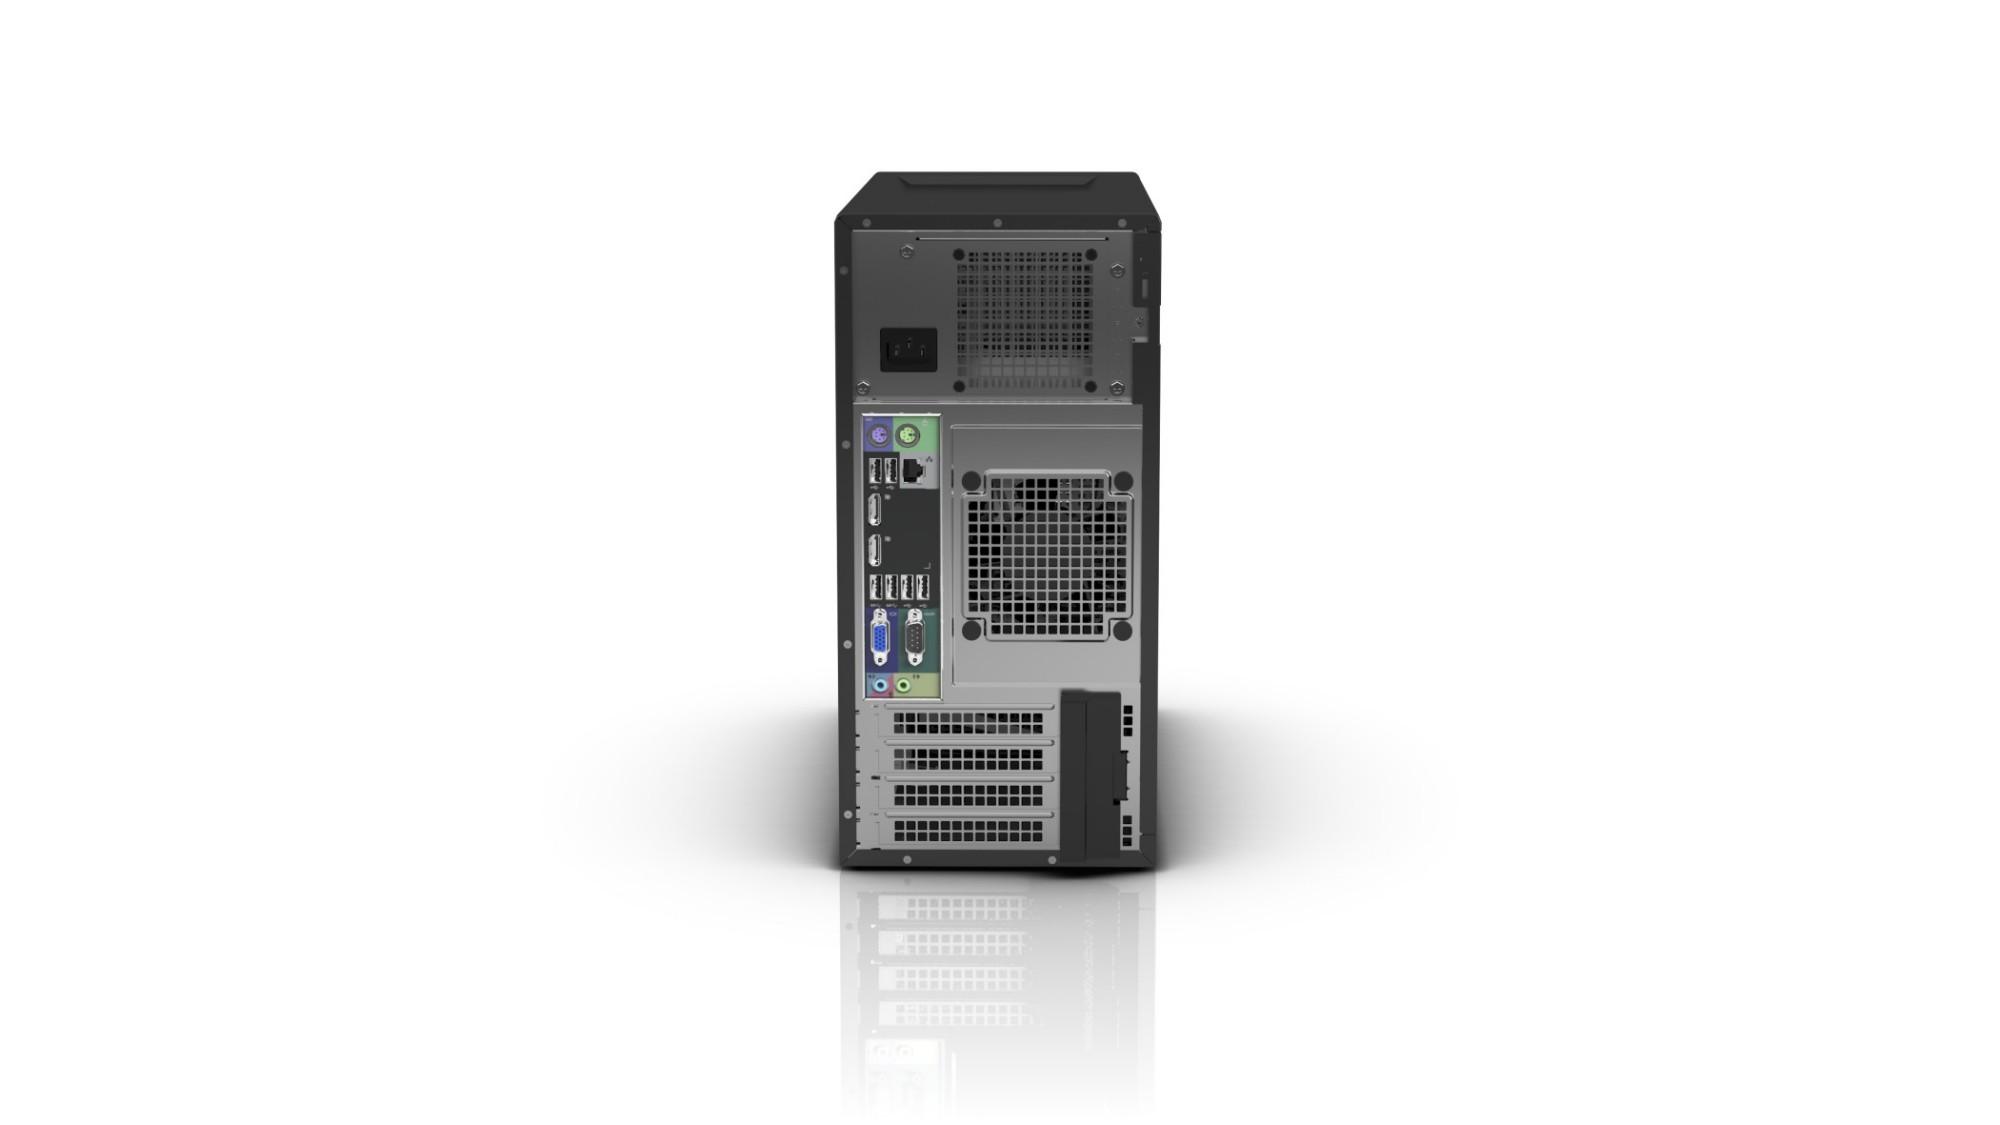 DELL PowerEdge T20 3.2GHz E3-1225V3 290W Mini Tower